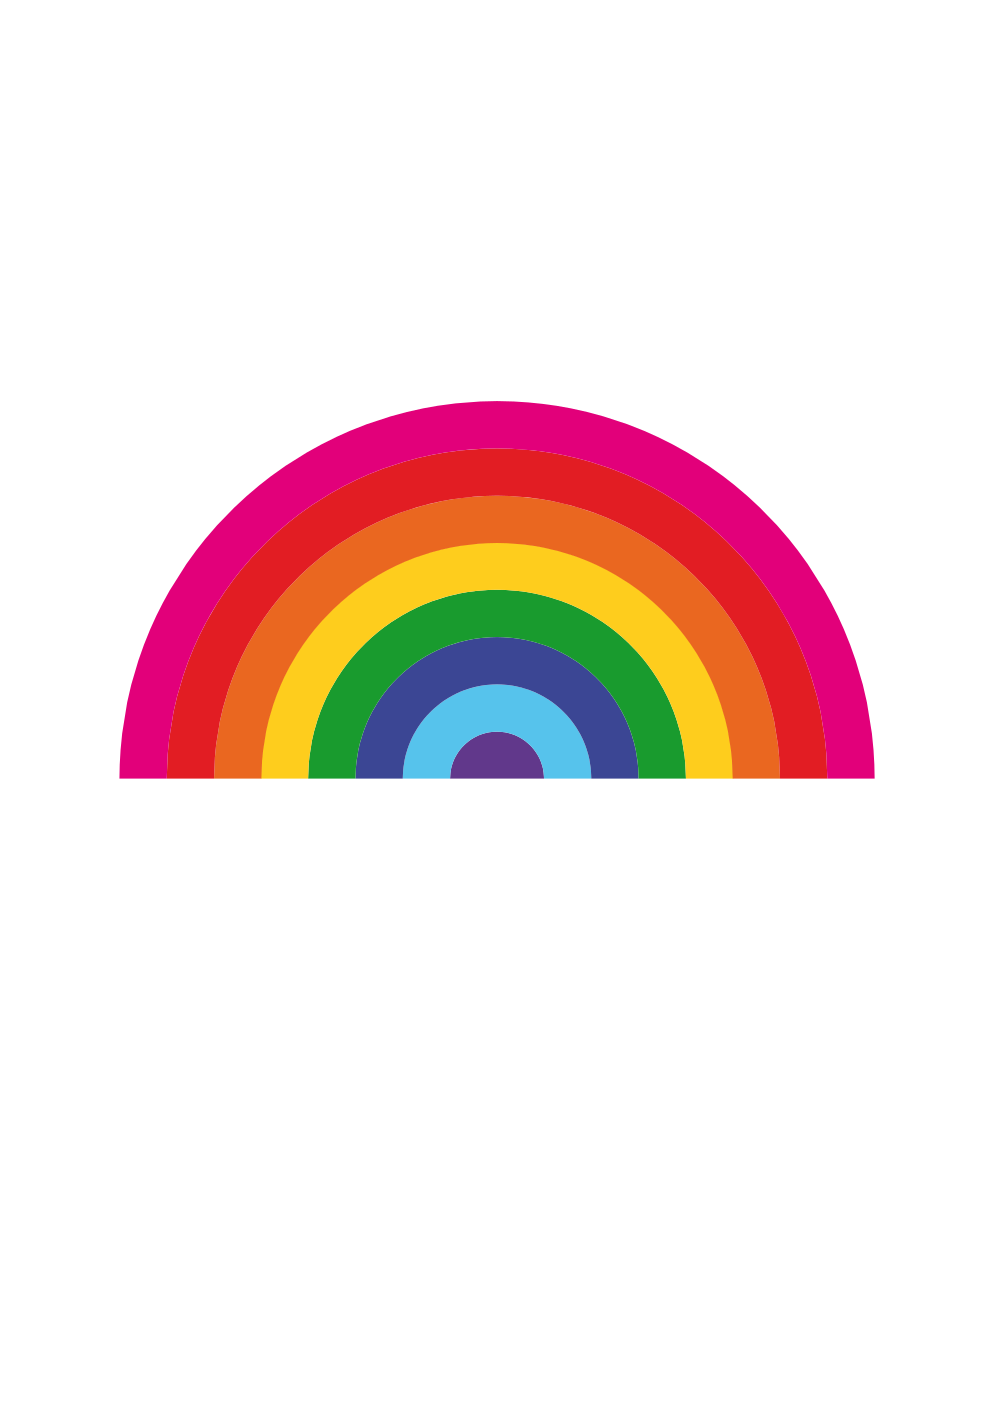 Cross with rainbow clipart image free stock OnlineLabels Clip Art - Ostadarra Arcoiris Rainbow image free stock